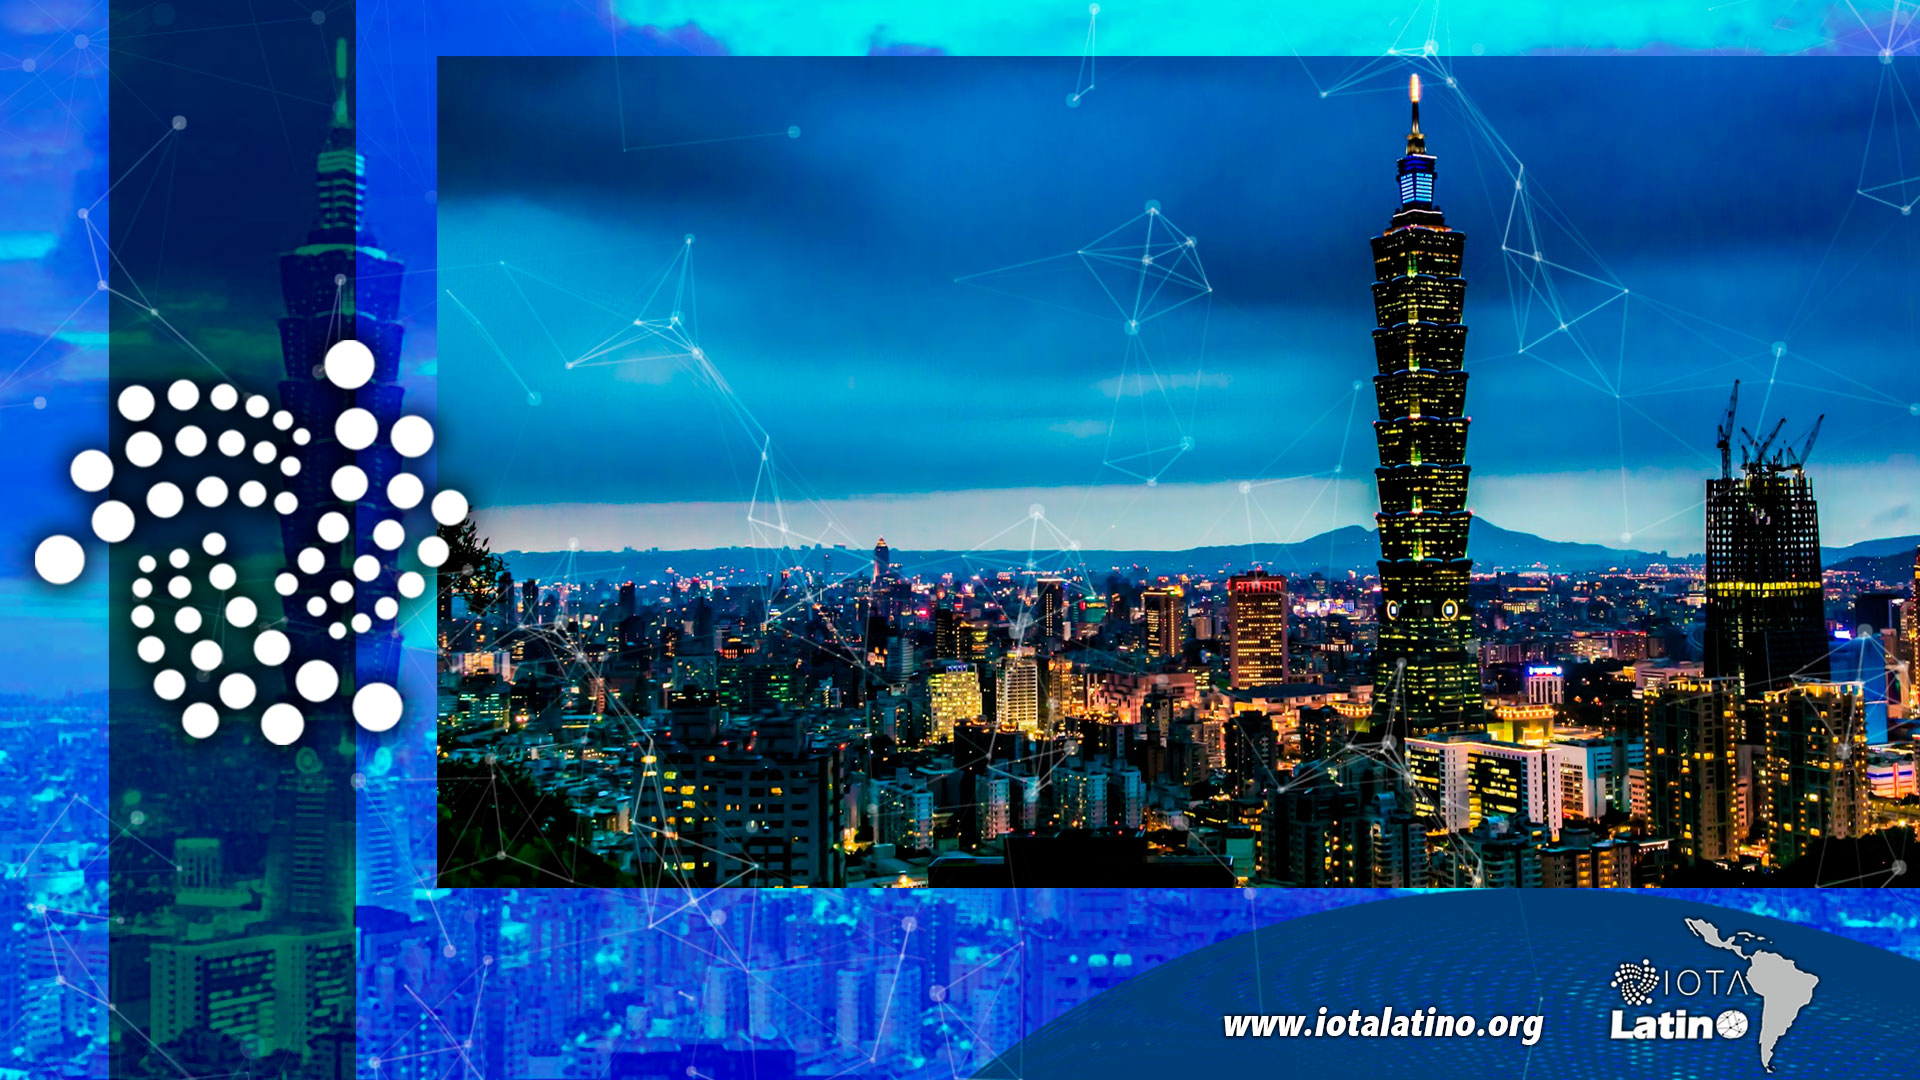 ciudad inteligente - IOTA Latino - 4